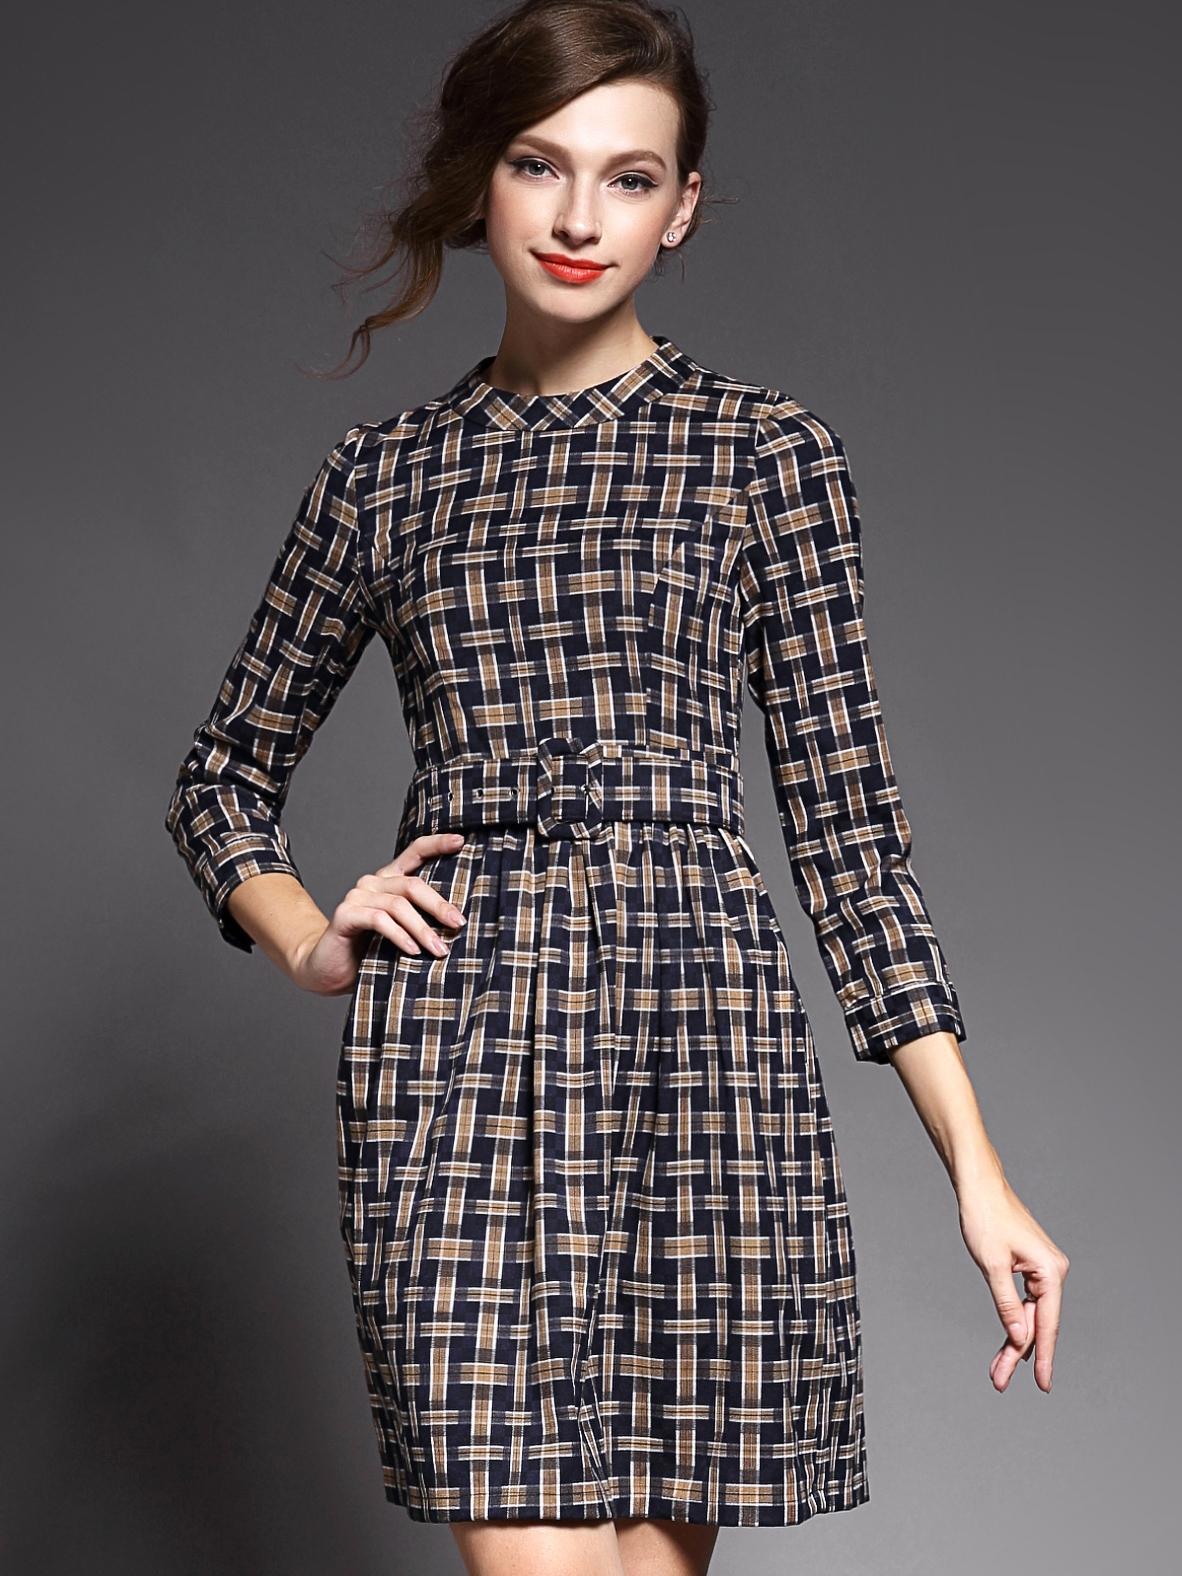 Khaki Round Neck Length Sleeve Drawstring Print Dress